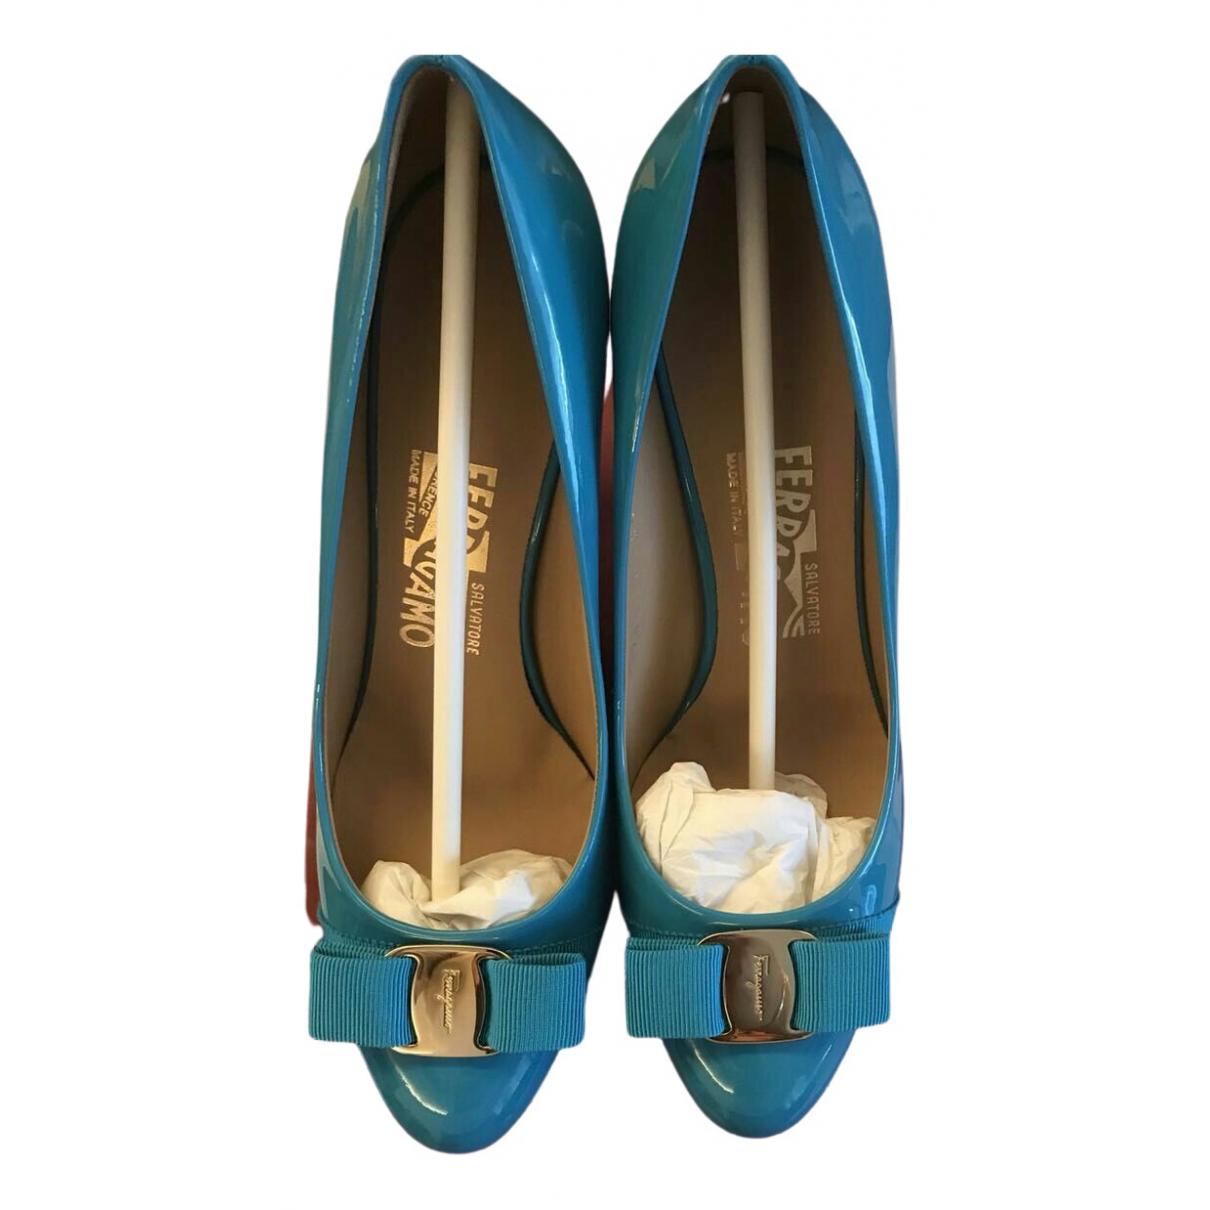 Salvatore Ferragamo \N Blue Patent leather Heels for Women 7 US